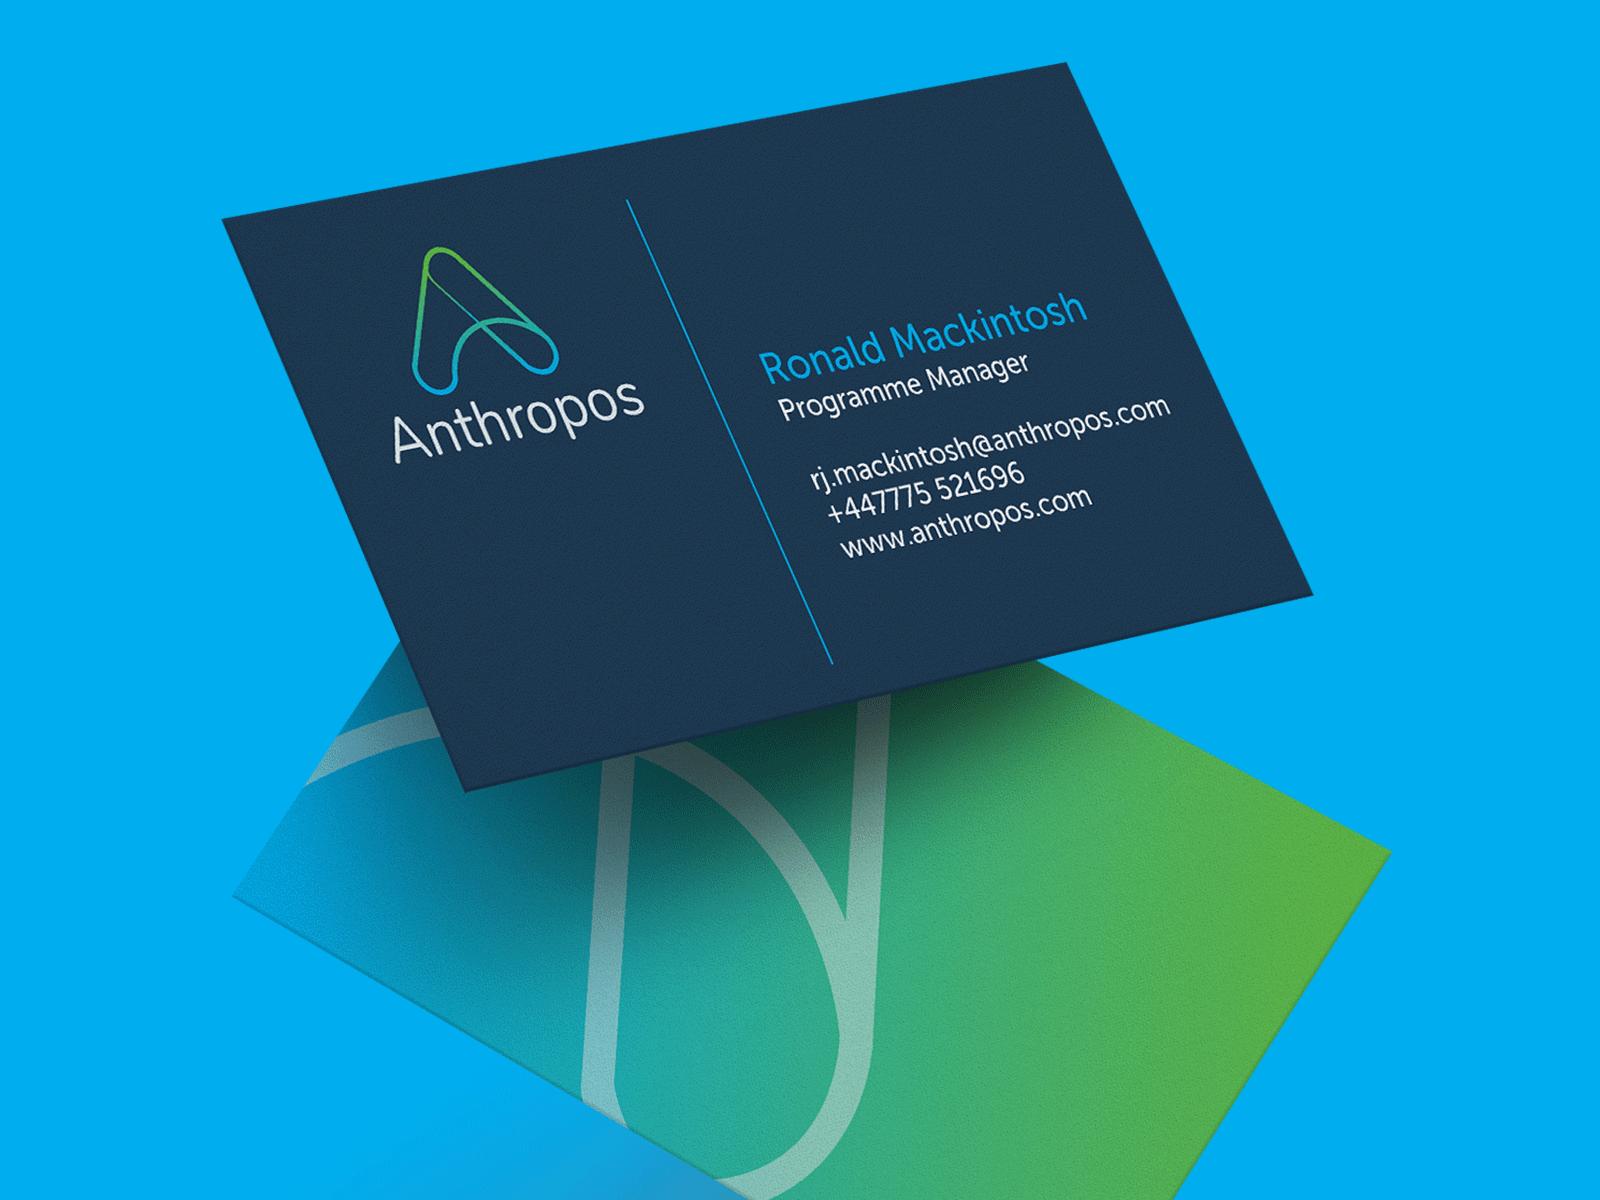 anthropos_home_desktop